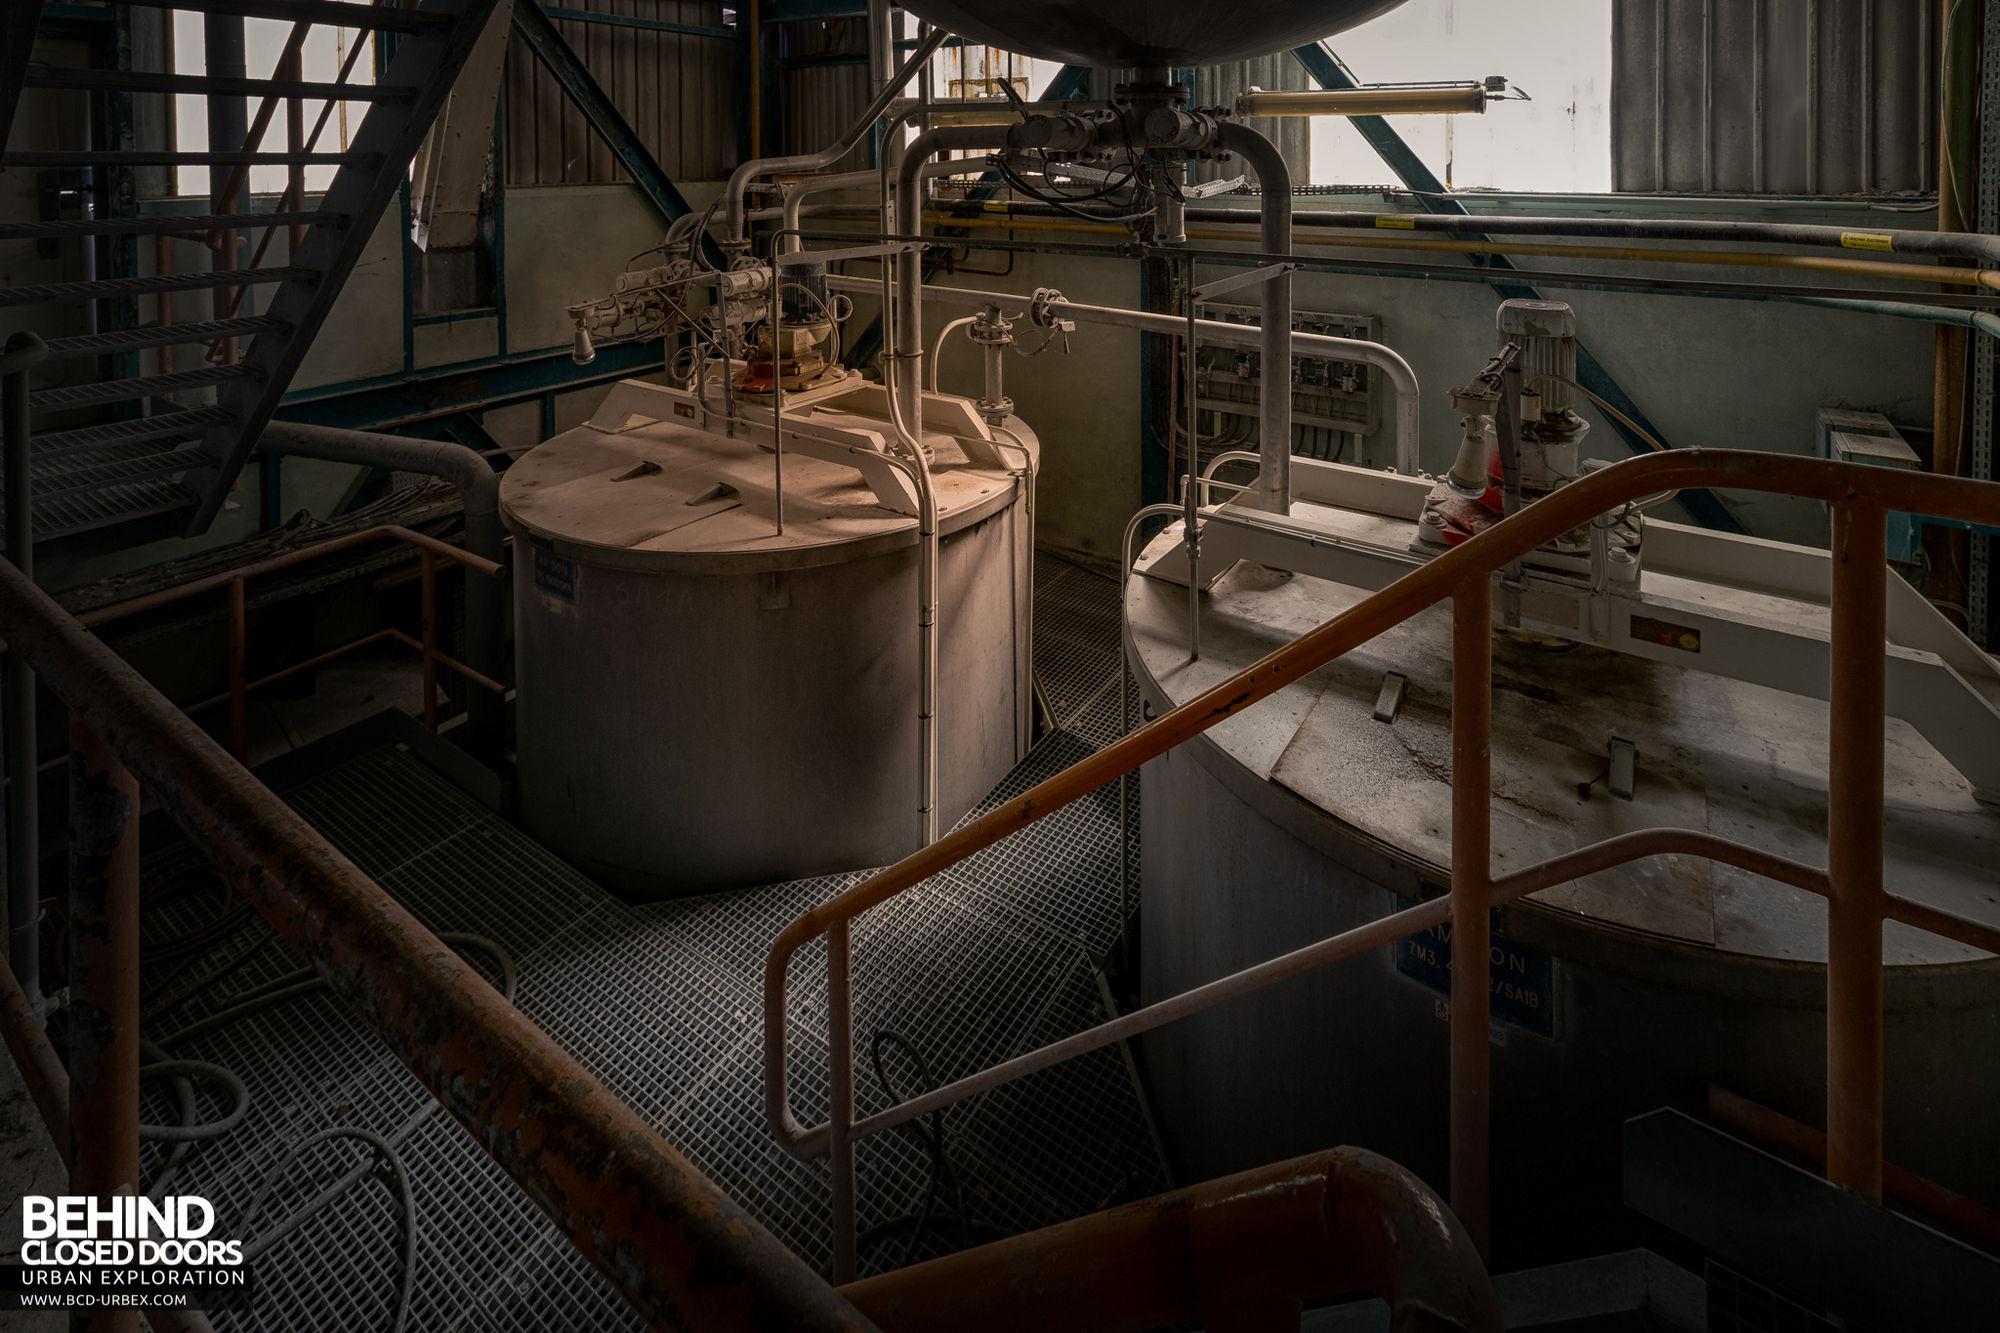 Stora Enso, Corbehem - Chemical pulping tanks